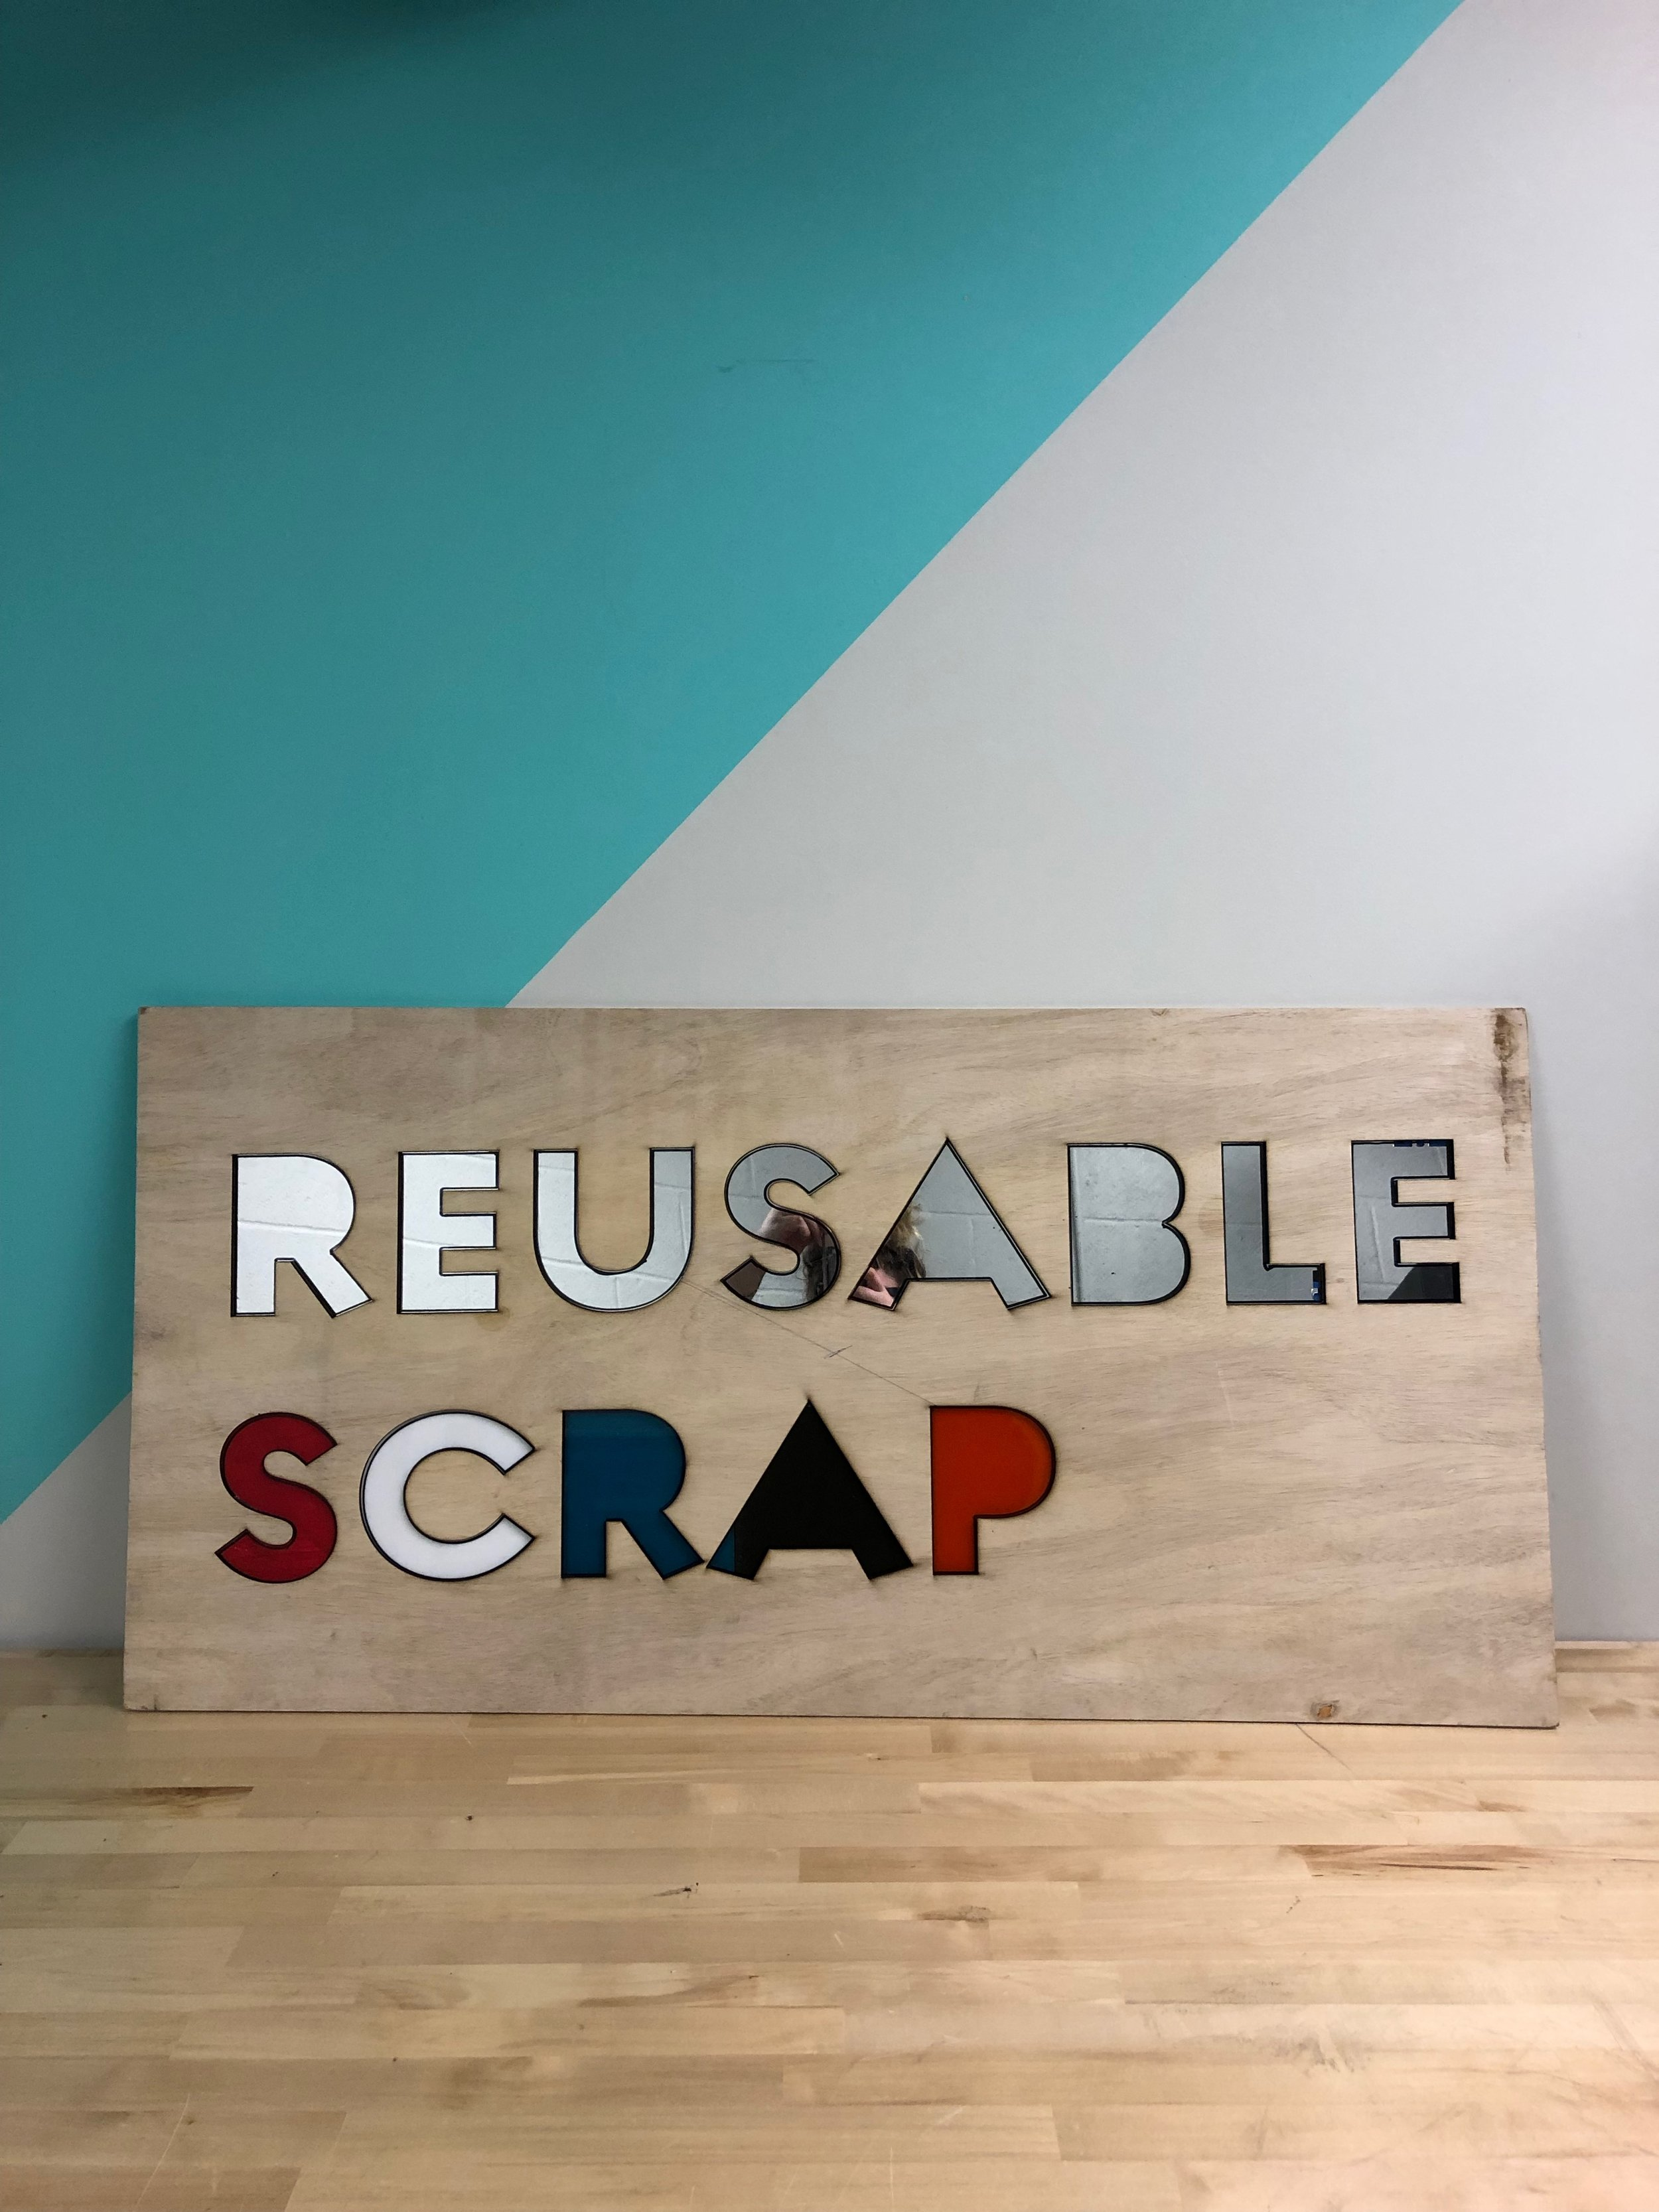 Reusable Scrap Sign